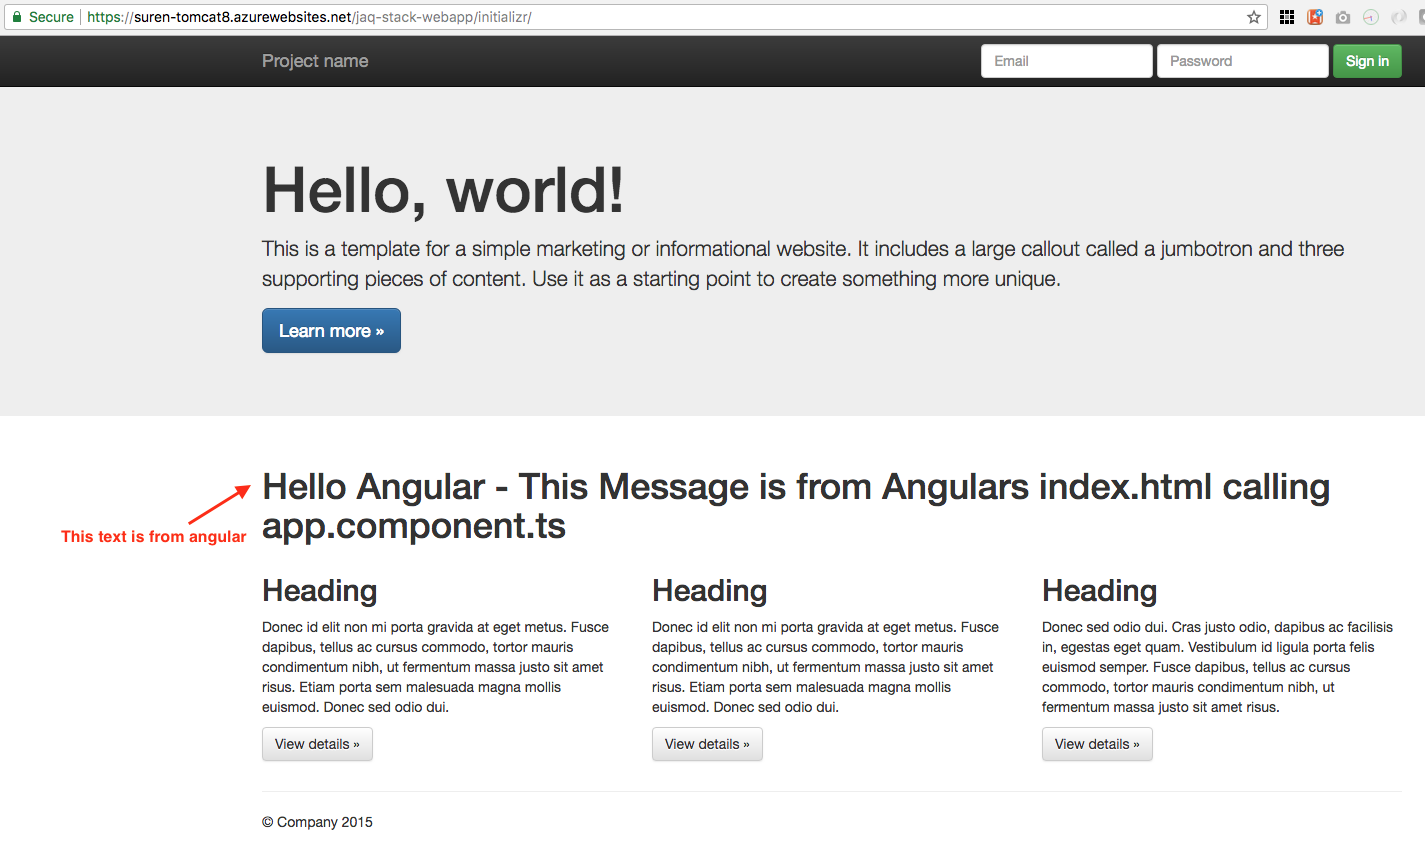 jaq-stack-sample-screen-webpage-initializr-angular